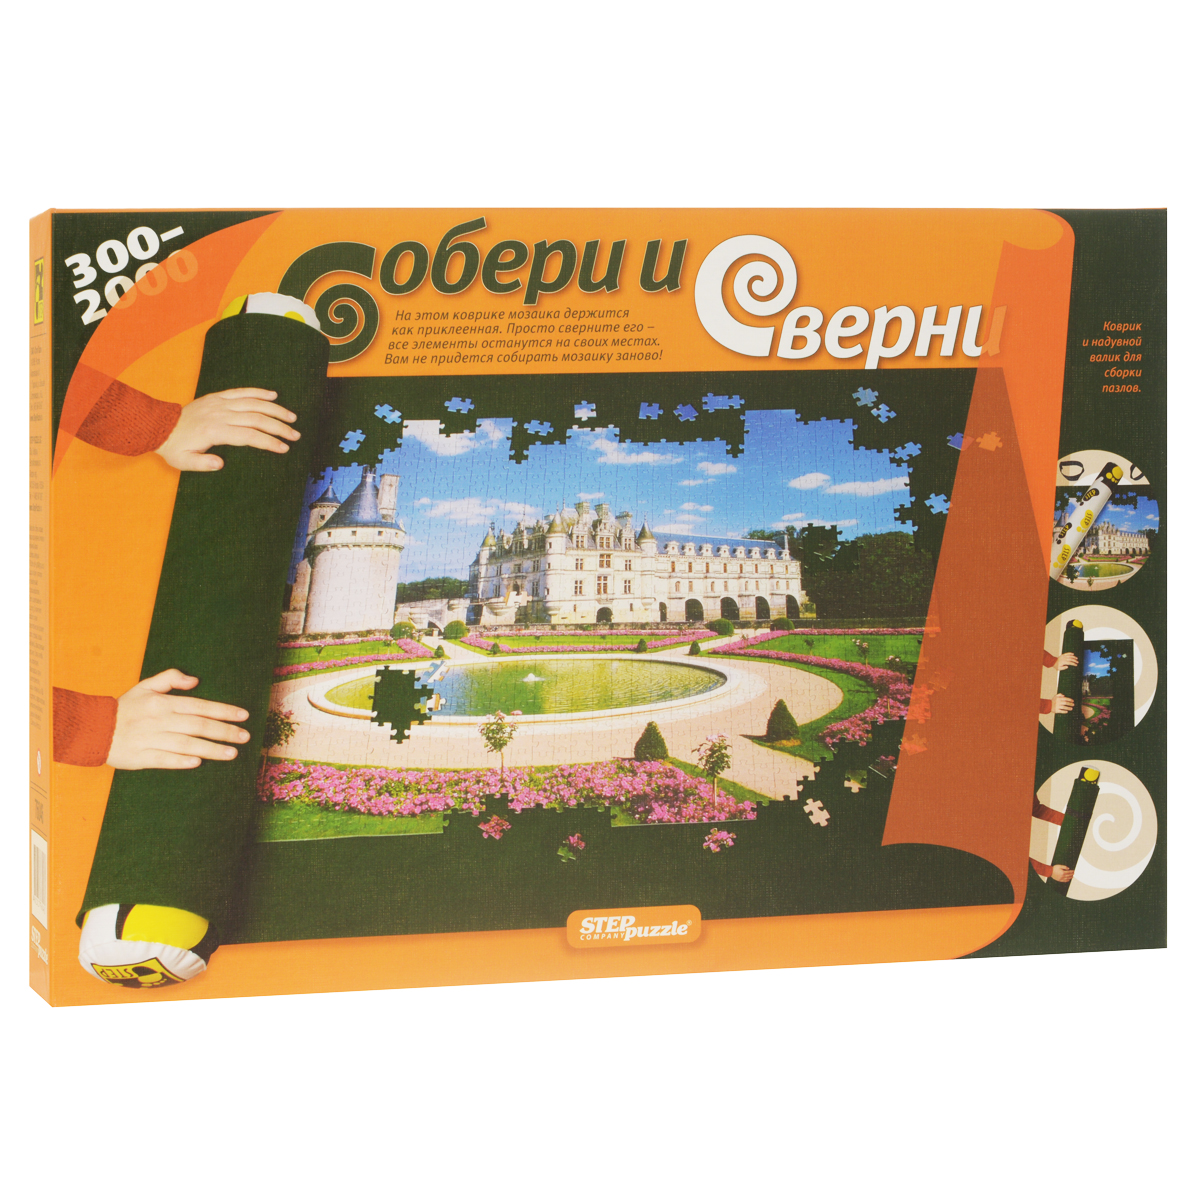 Набор для сборки пазлов Steppuzzle, 4 предмета